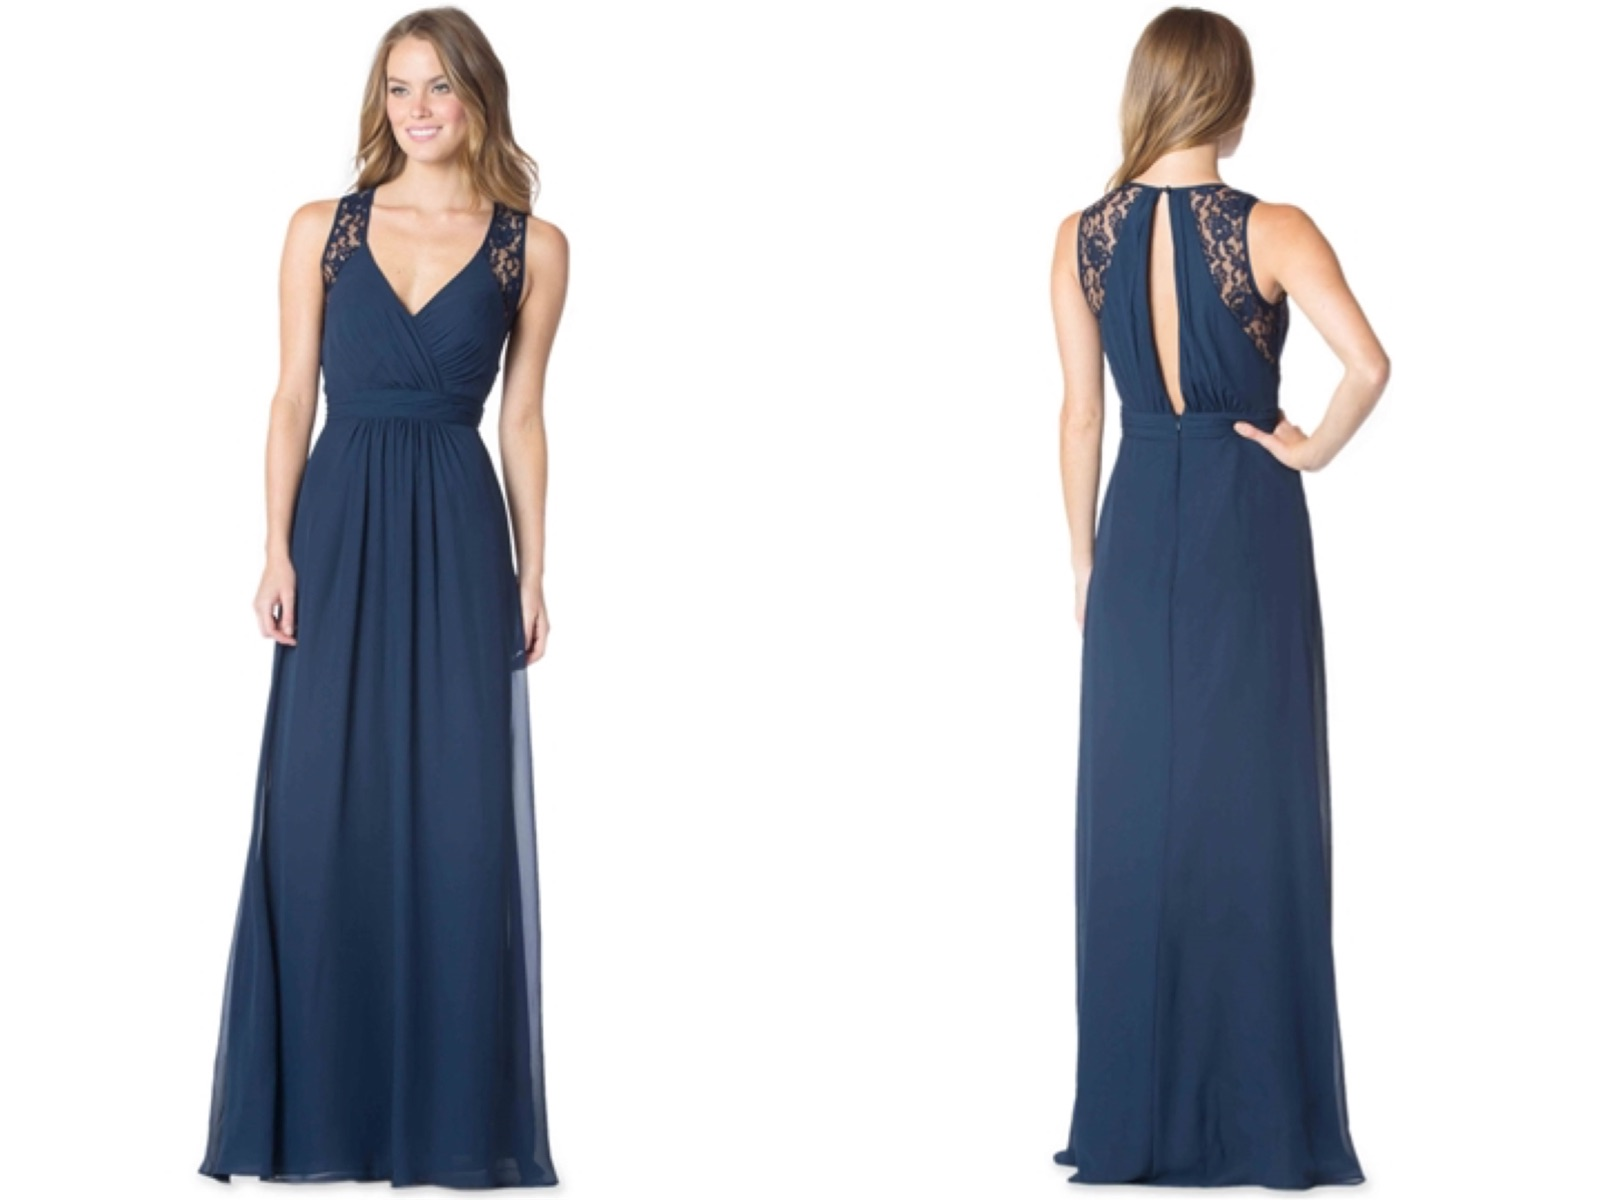 Dlugie sukienki na wesele (3)